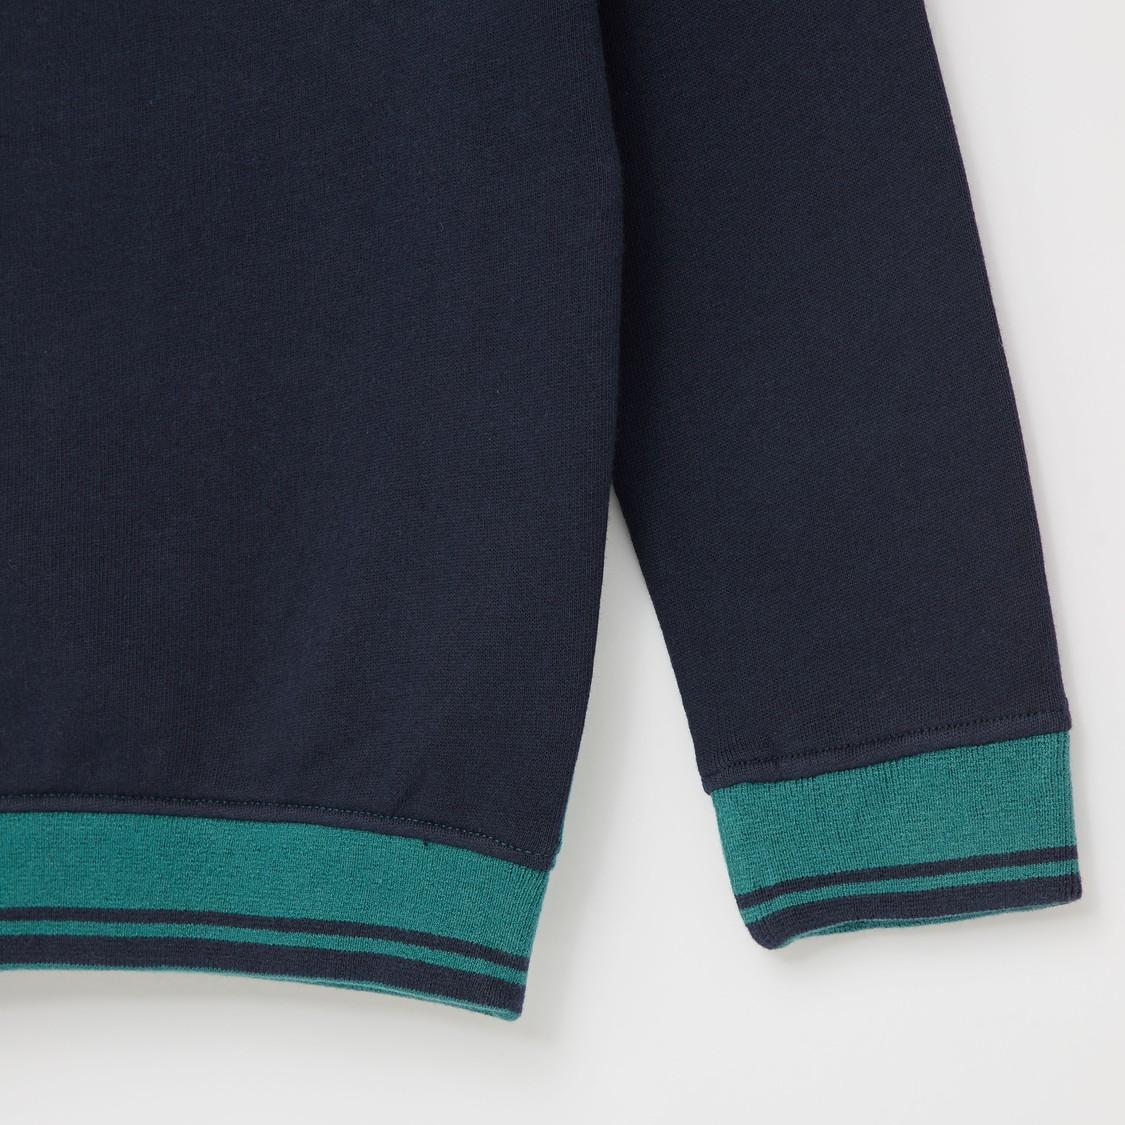 Printed High Neck Sweatshirt with Long Sleeves and Zip Closure